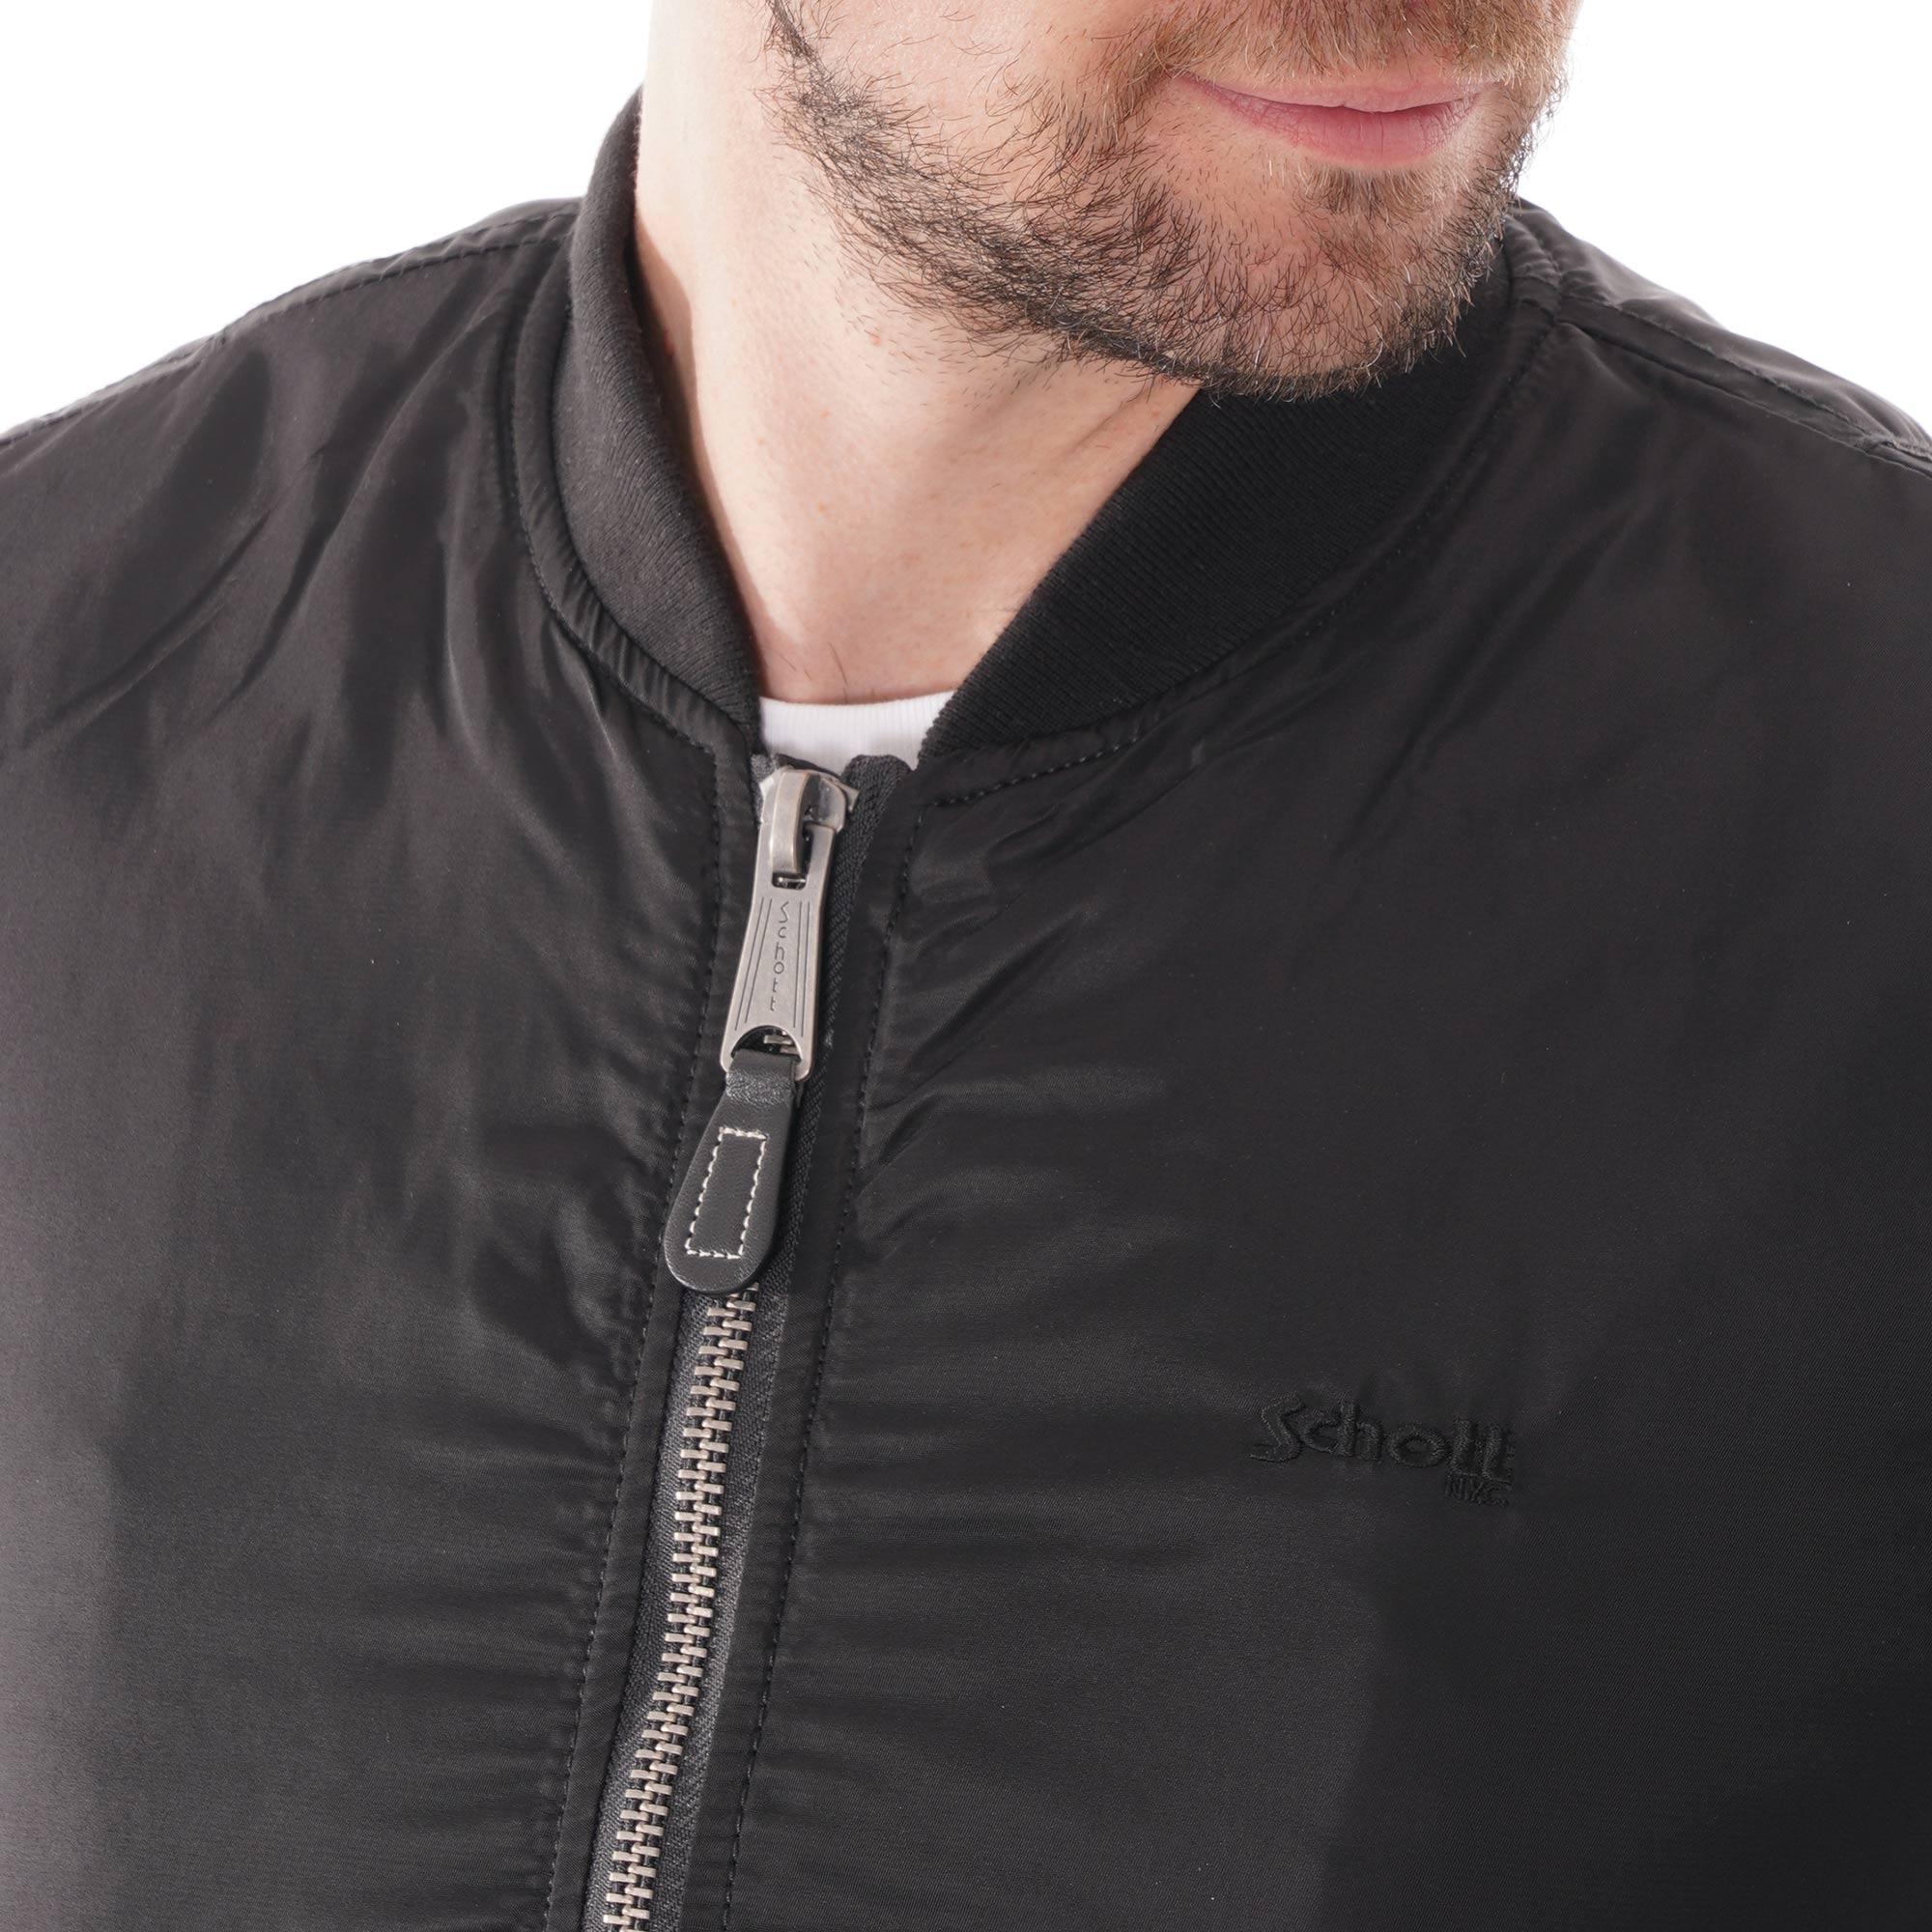 schott air force 1 bomber jacket Shop Clothing & Shoes Online